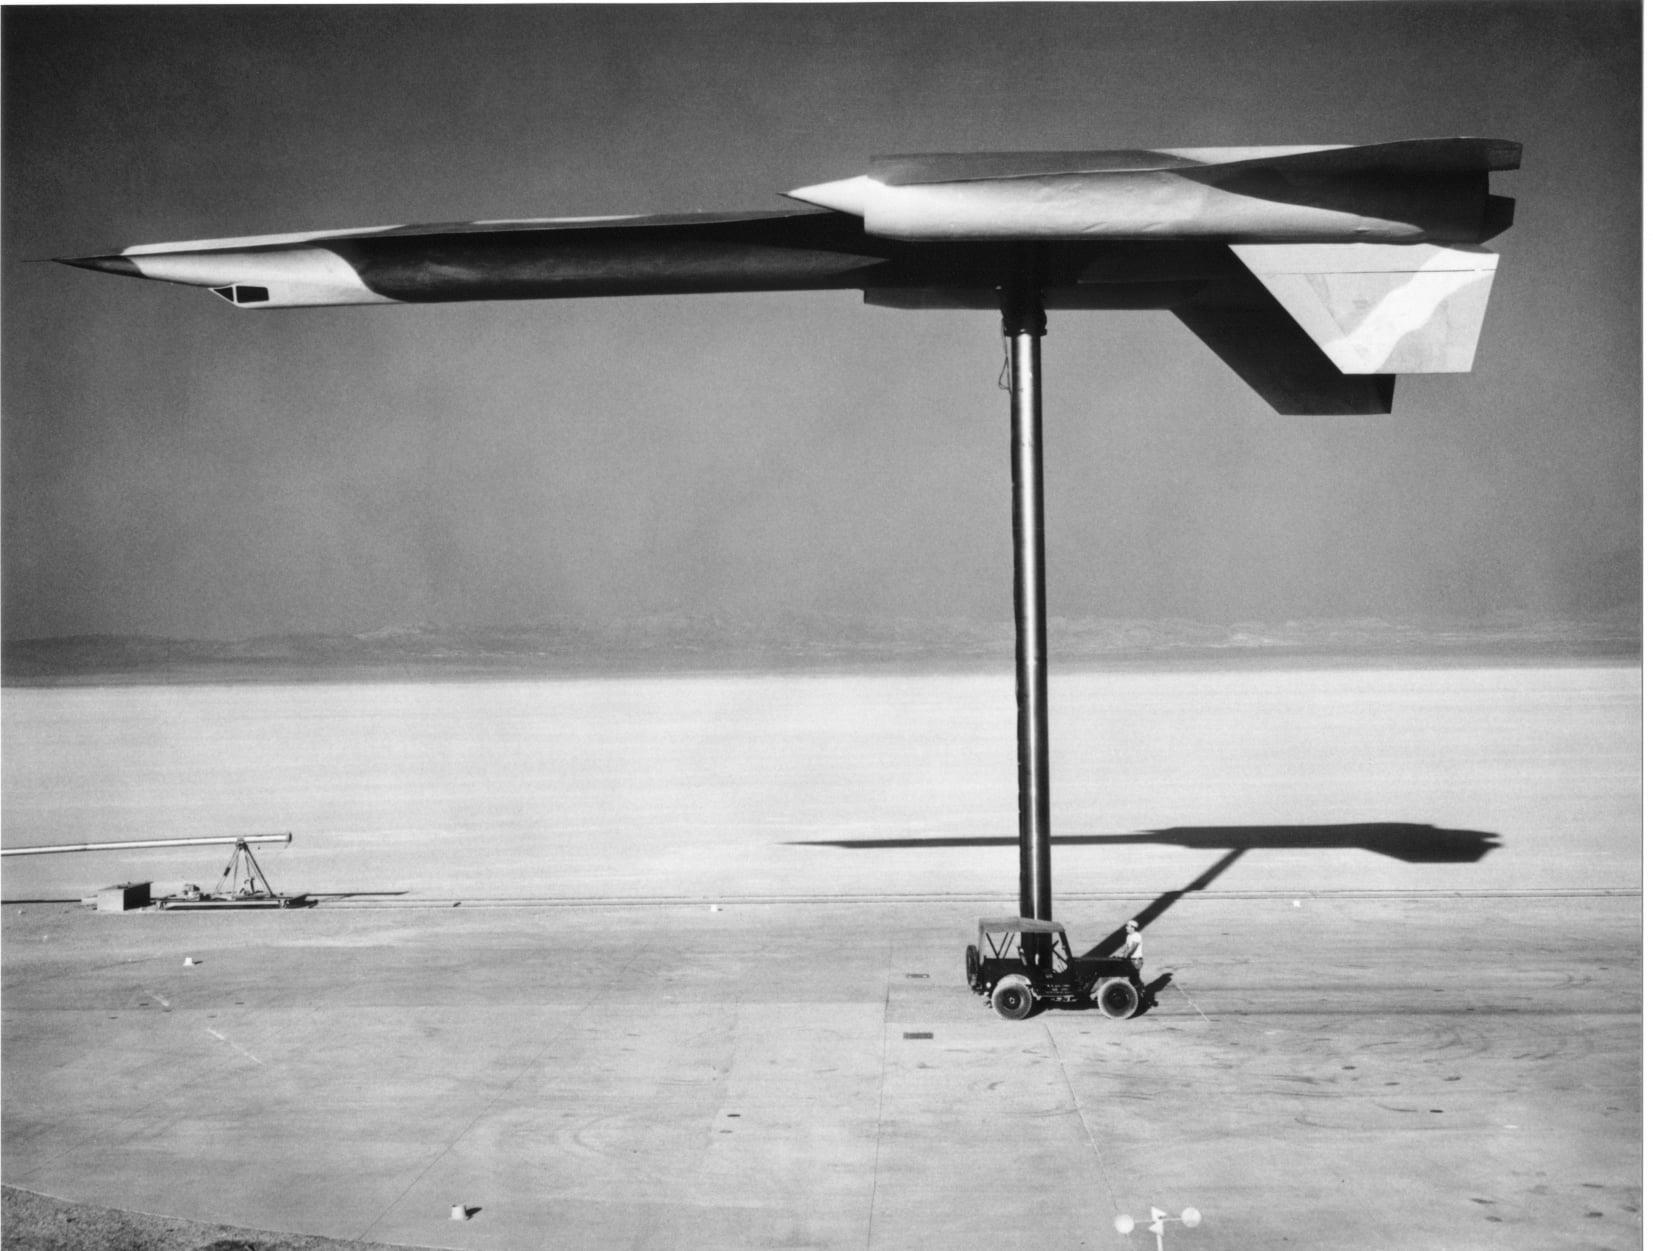 Area 51 Engineer Drops Declassified Photos of the CIA's Secret Spy Plane